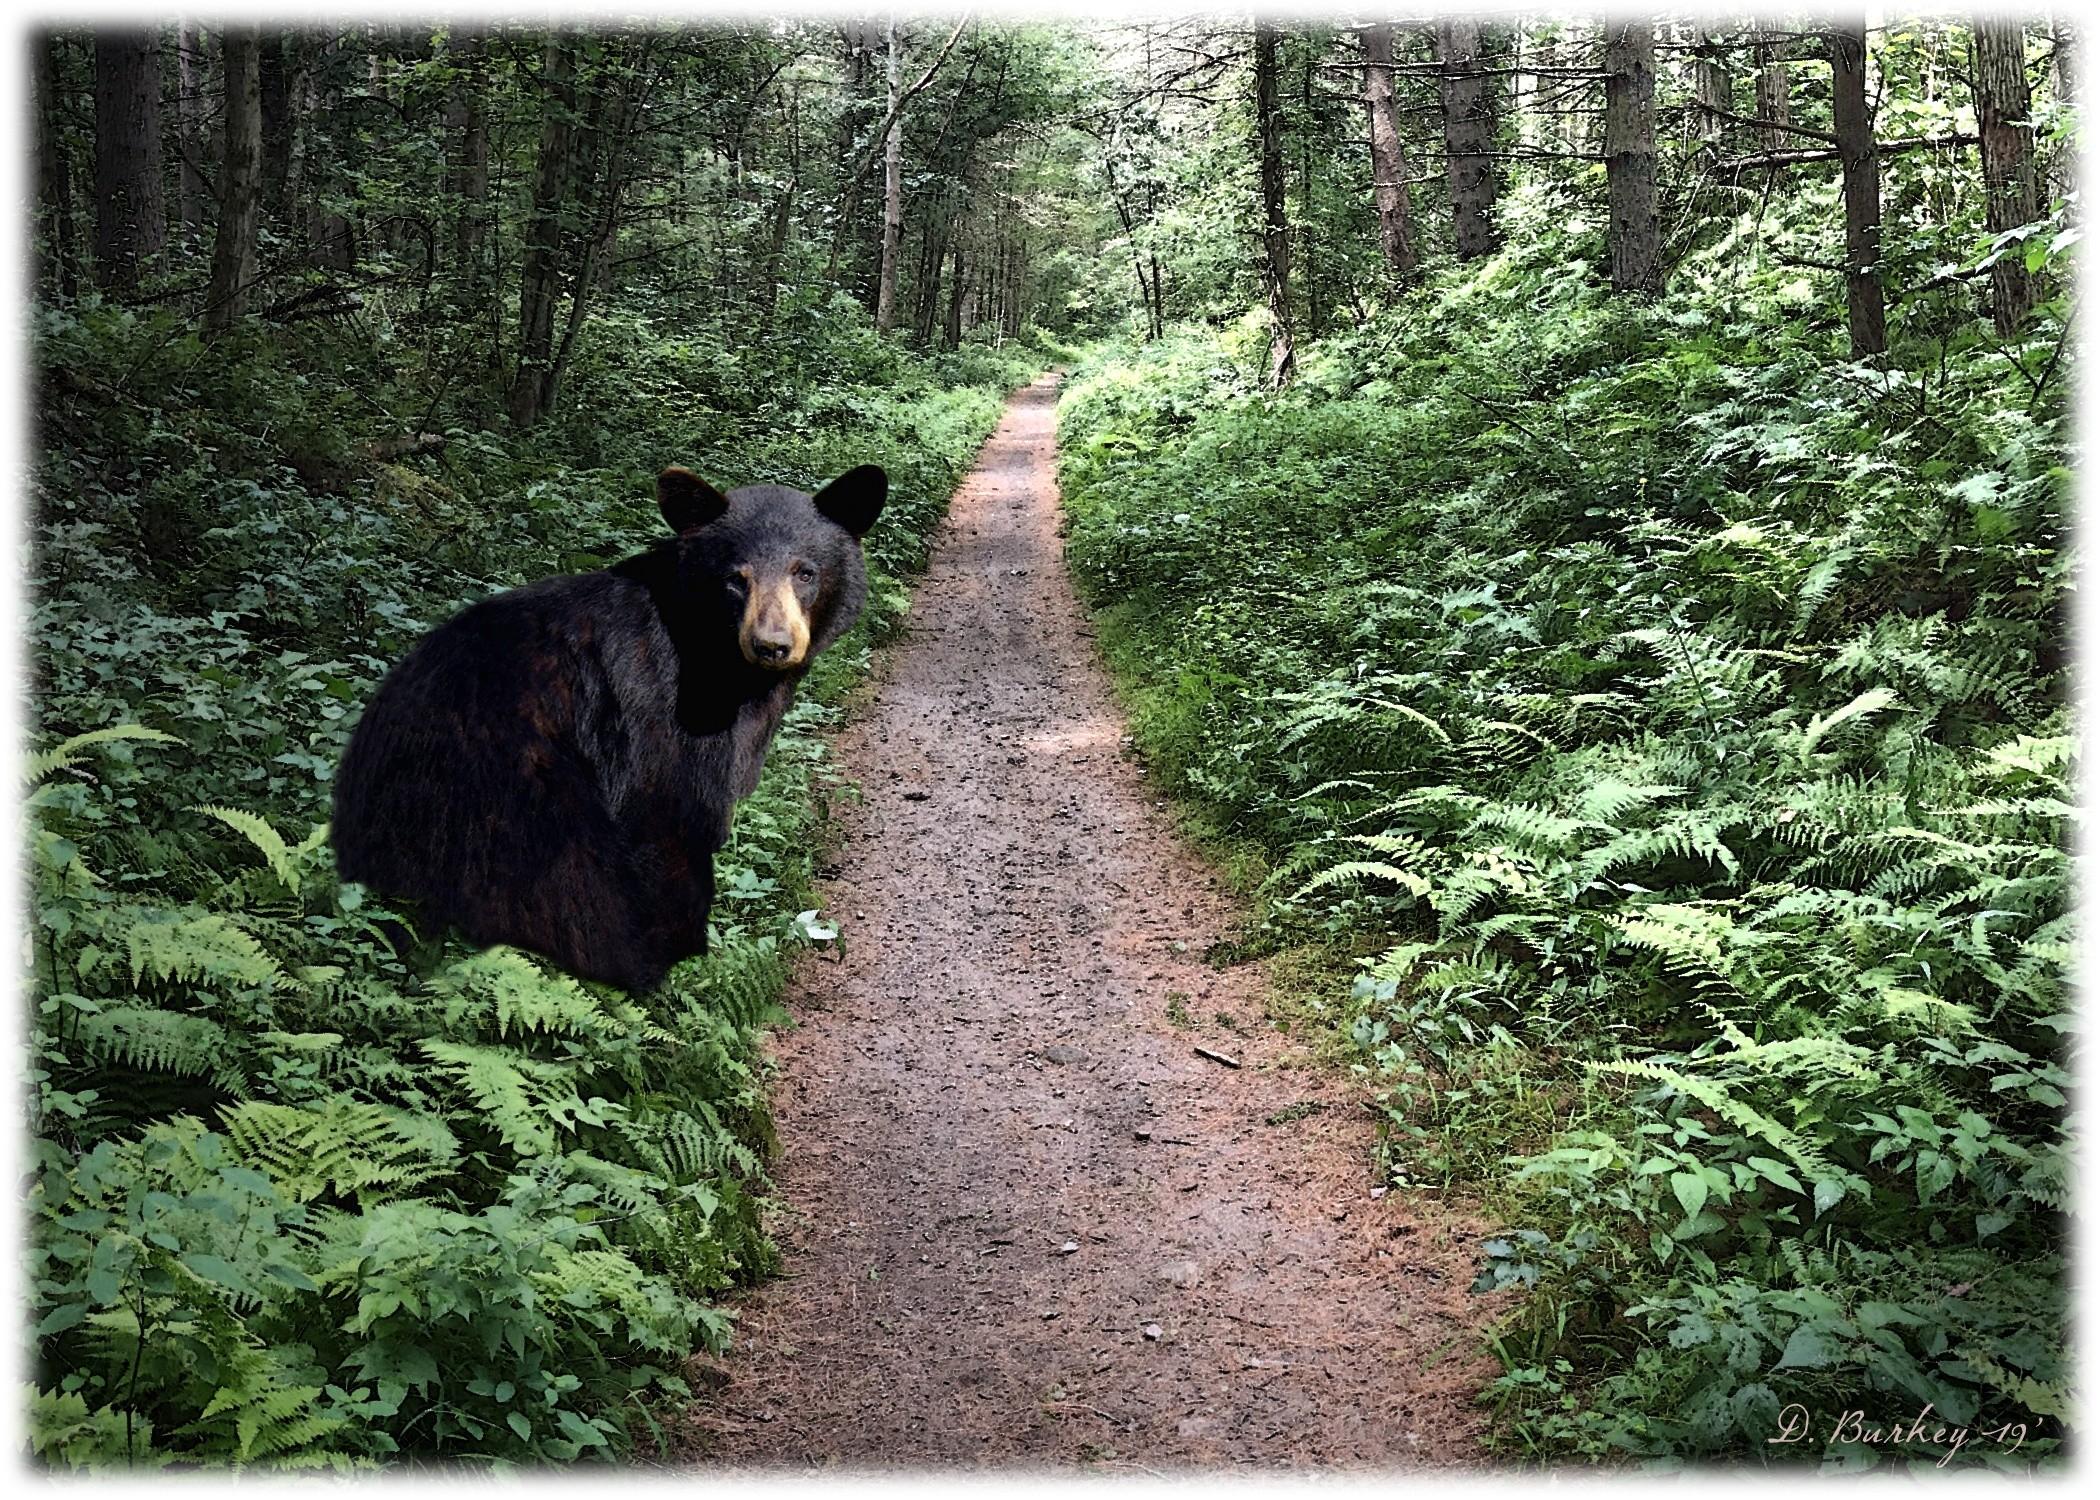 Black Bear, Herkimer County, Southern Adirondacks © Darren Burkey